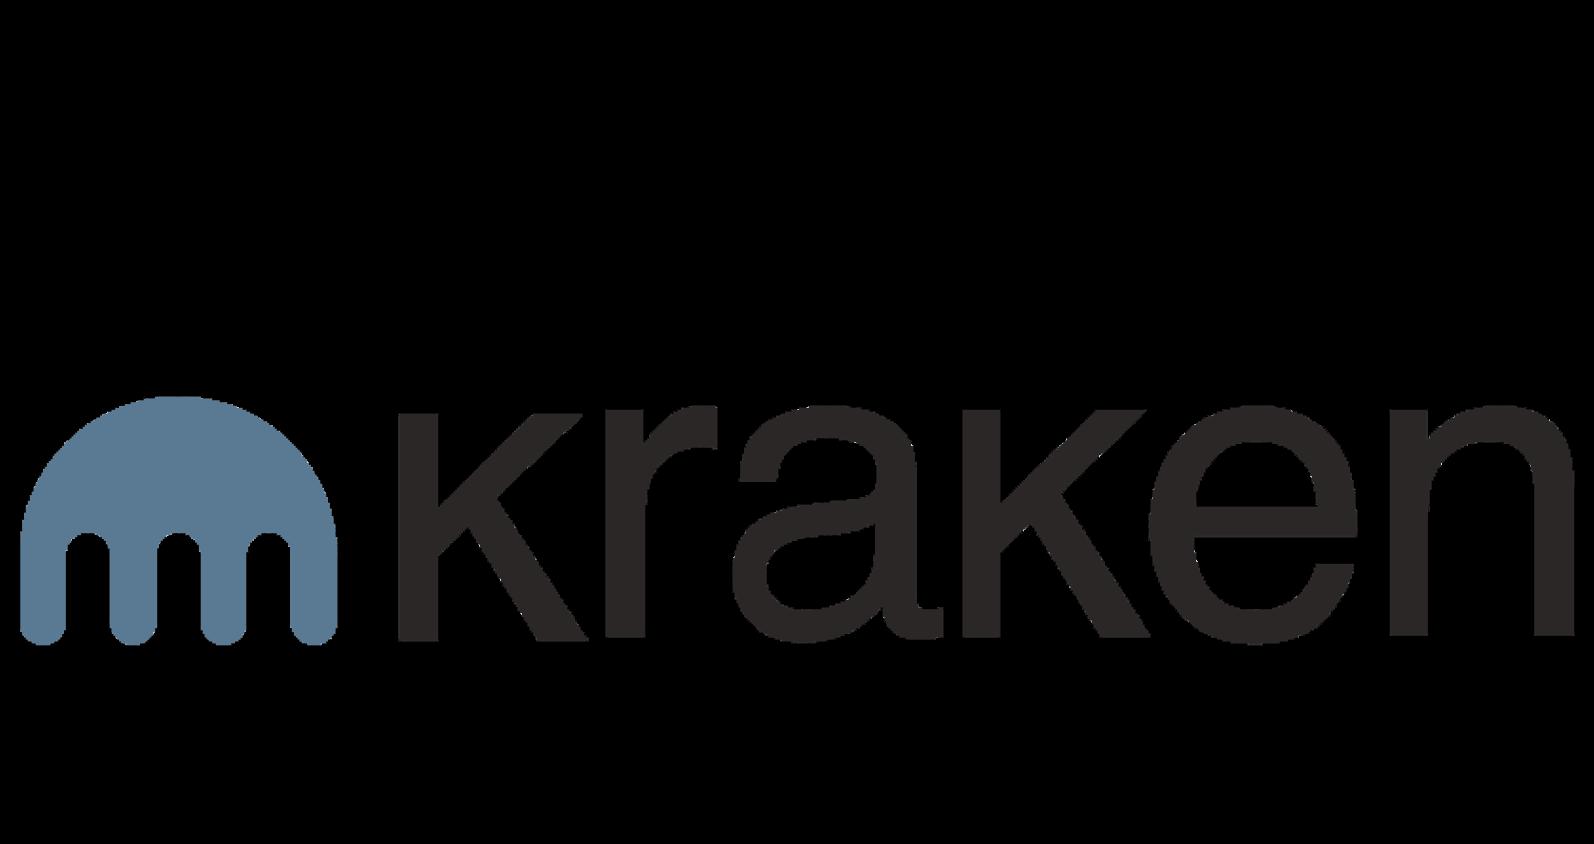 The Kraken cryptocurrency exchange